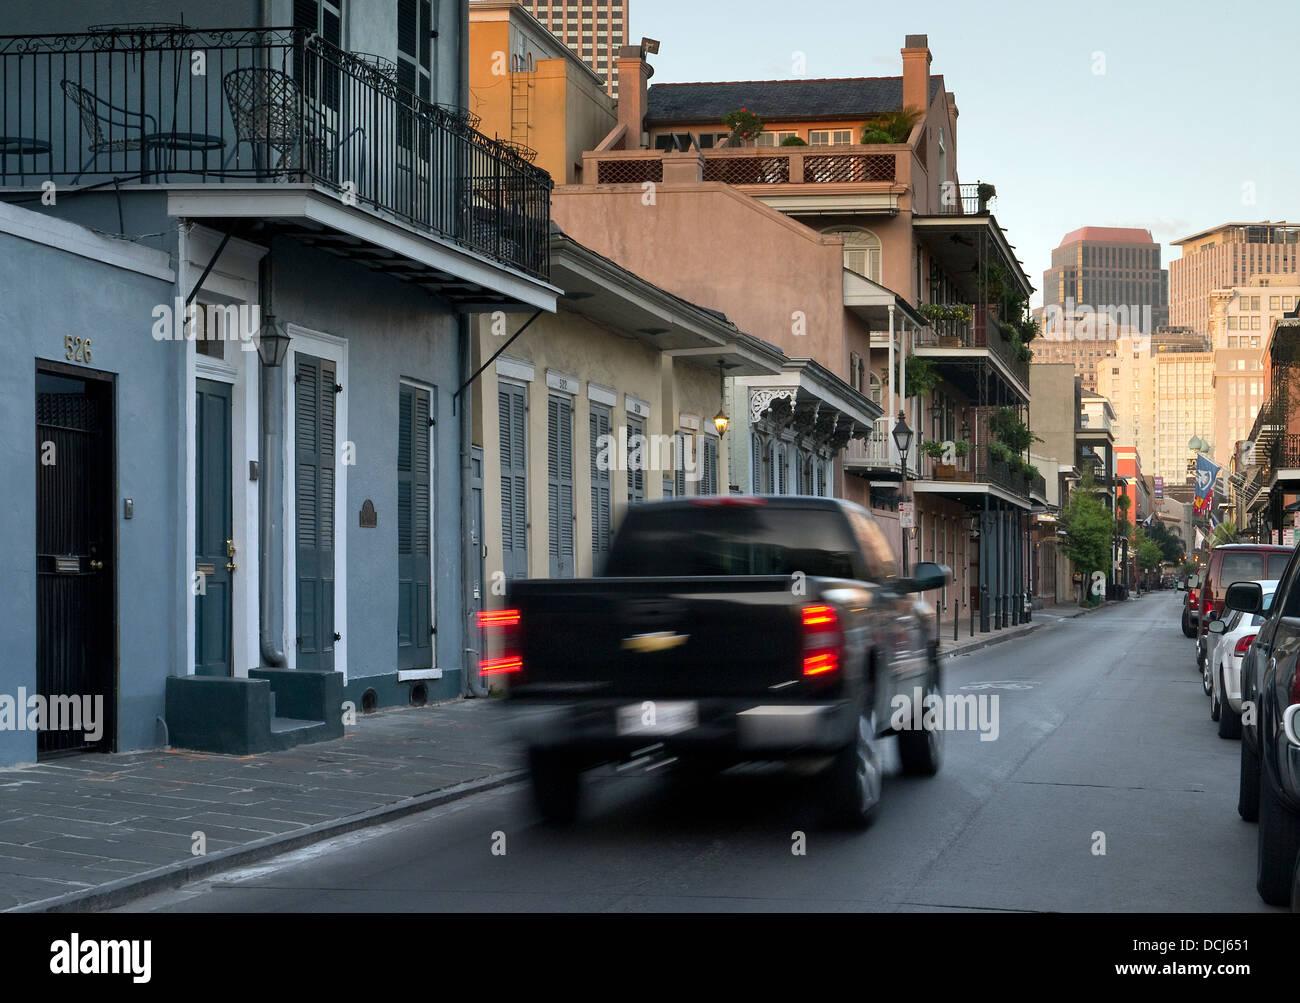 French Quarter Stock Photos & French Quarter Stock Images - Alamy